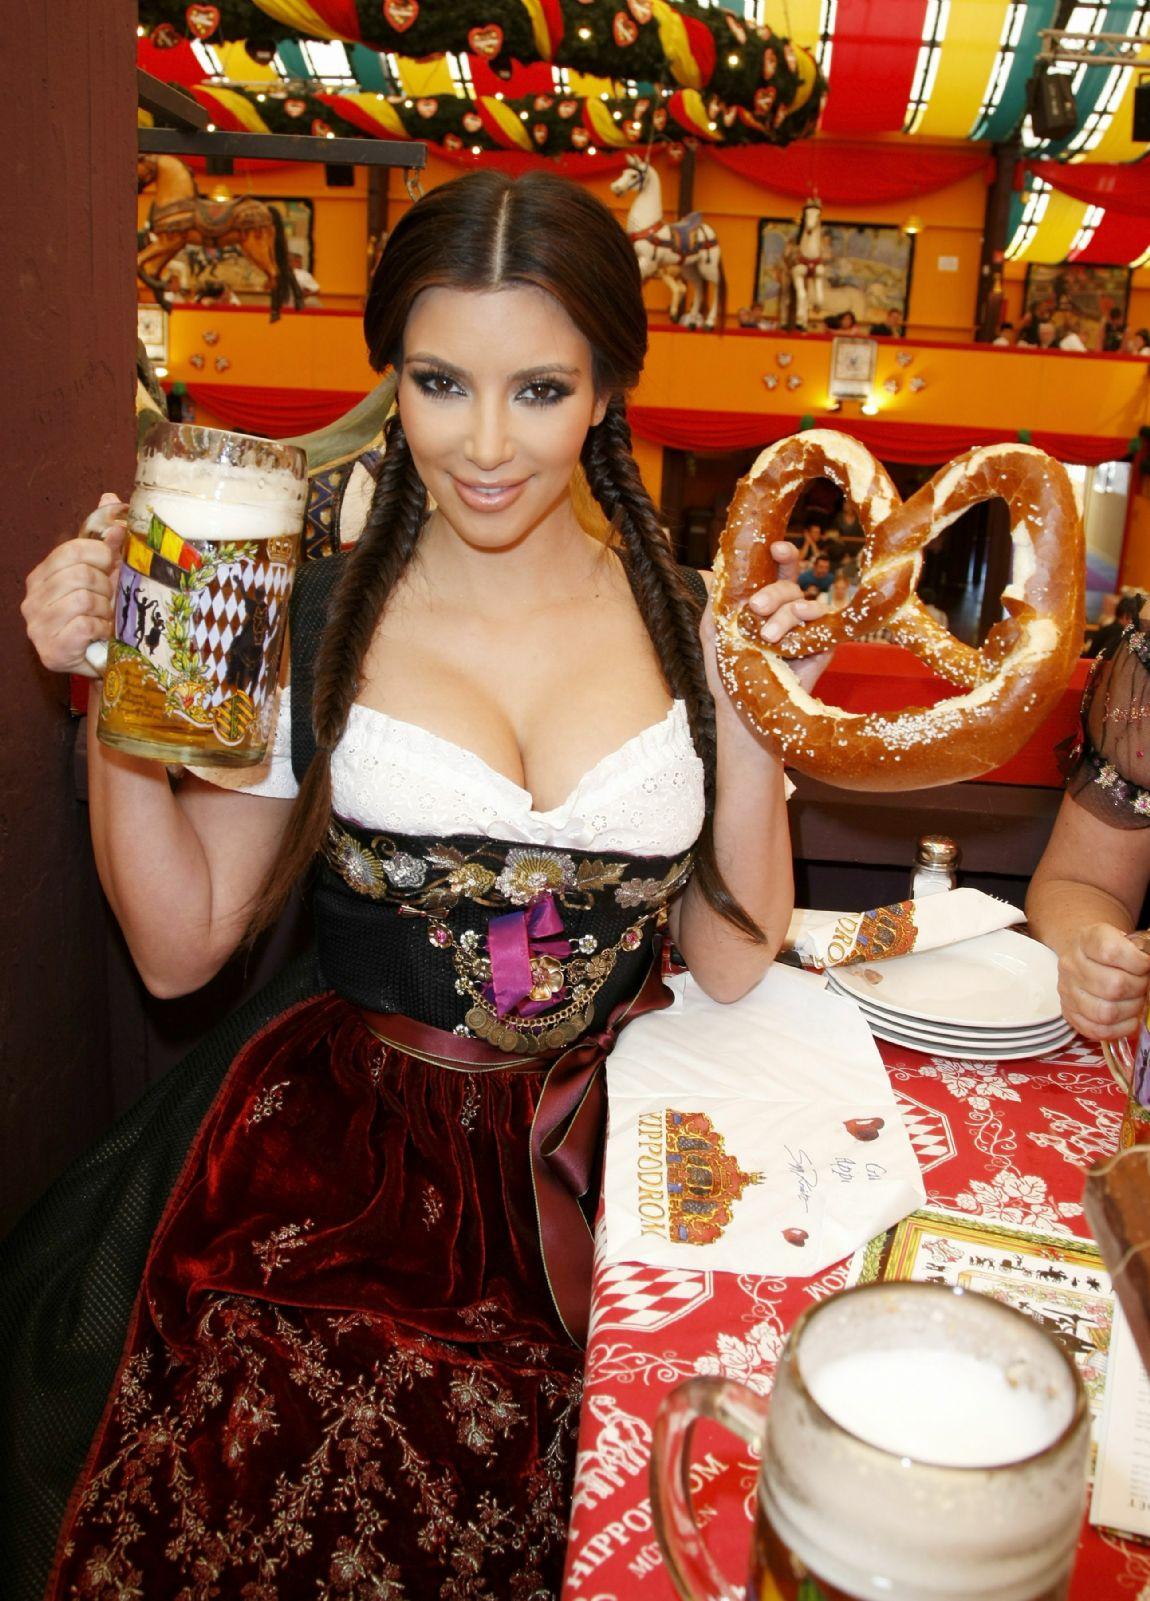 http://www.theplace.ru/archive/kim_kardashian/img/rs687777948995108.jpg